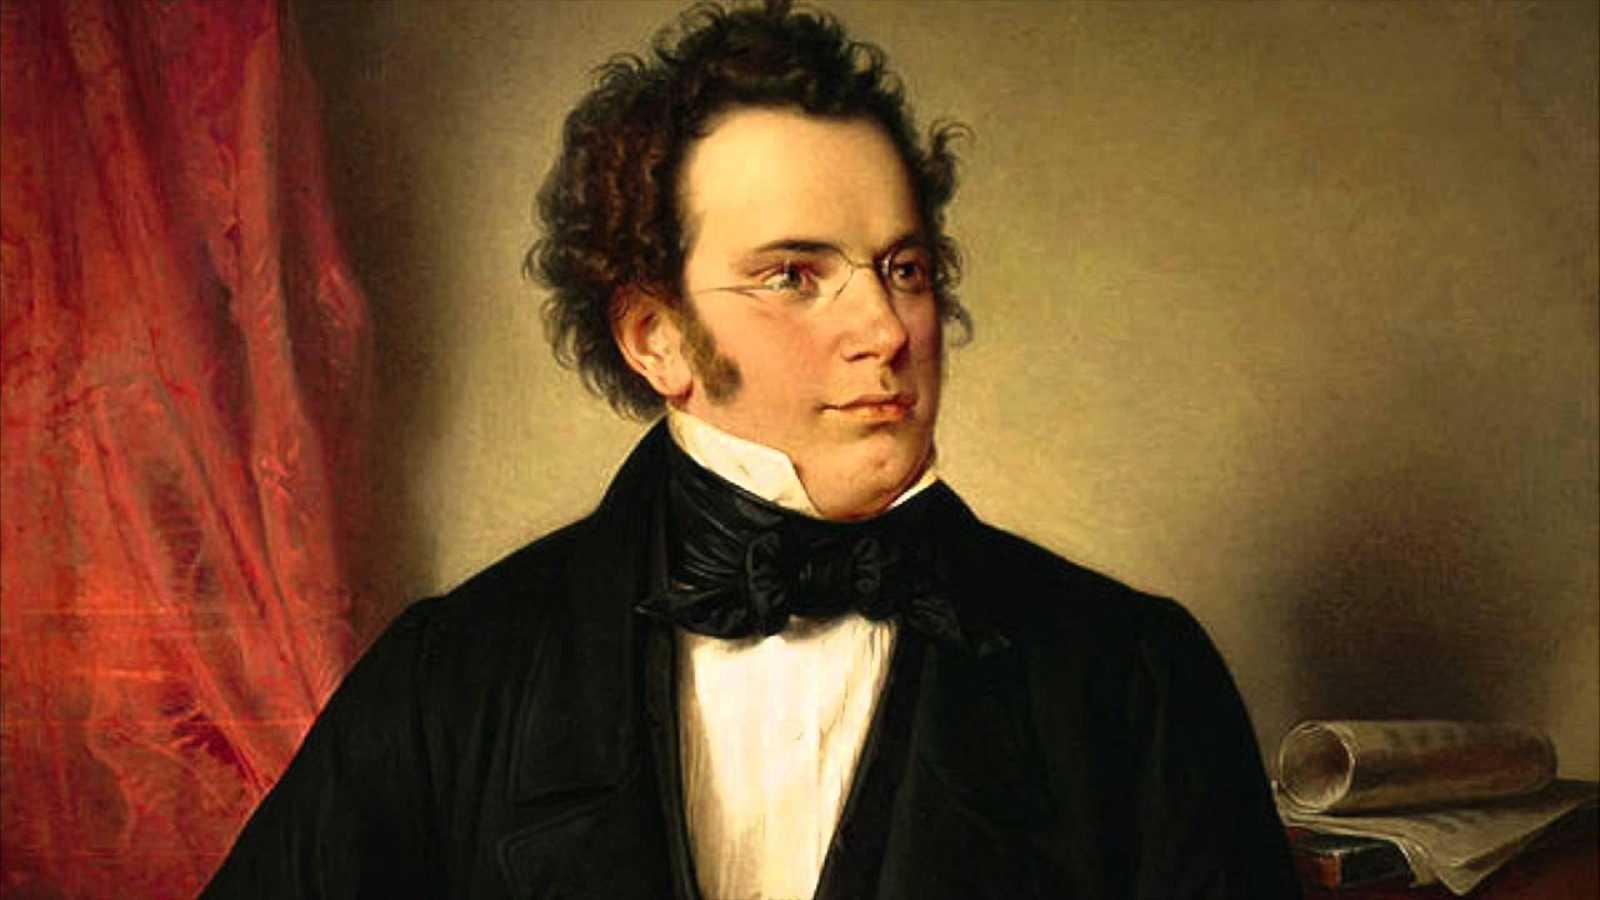 En Clave de 5 - Primera parte - Schubert camerístico - 05/12/20 - Escuchar ahora